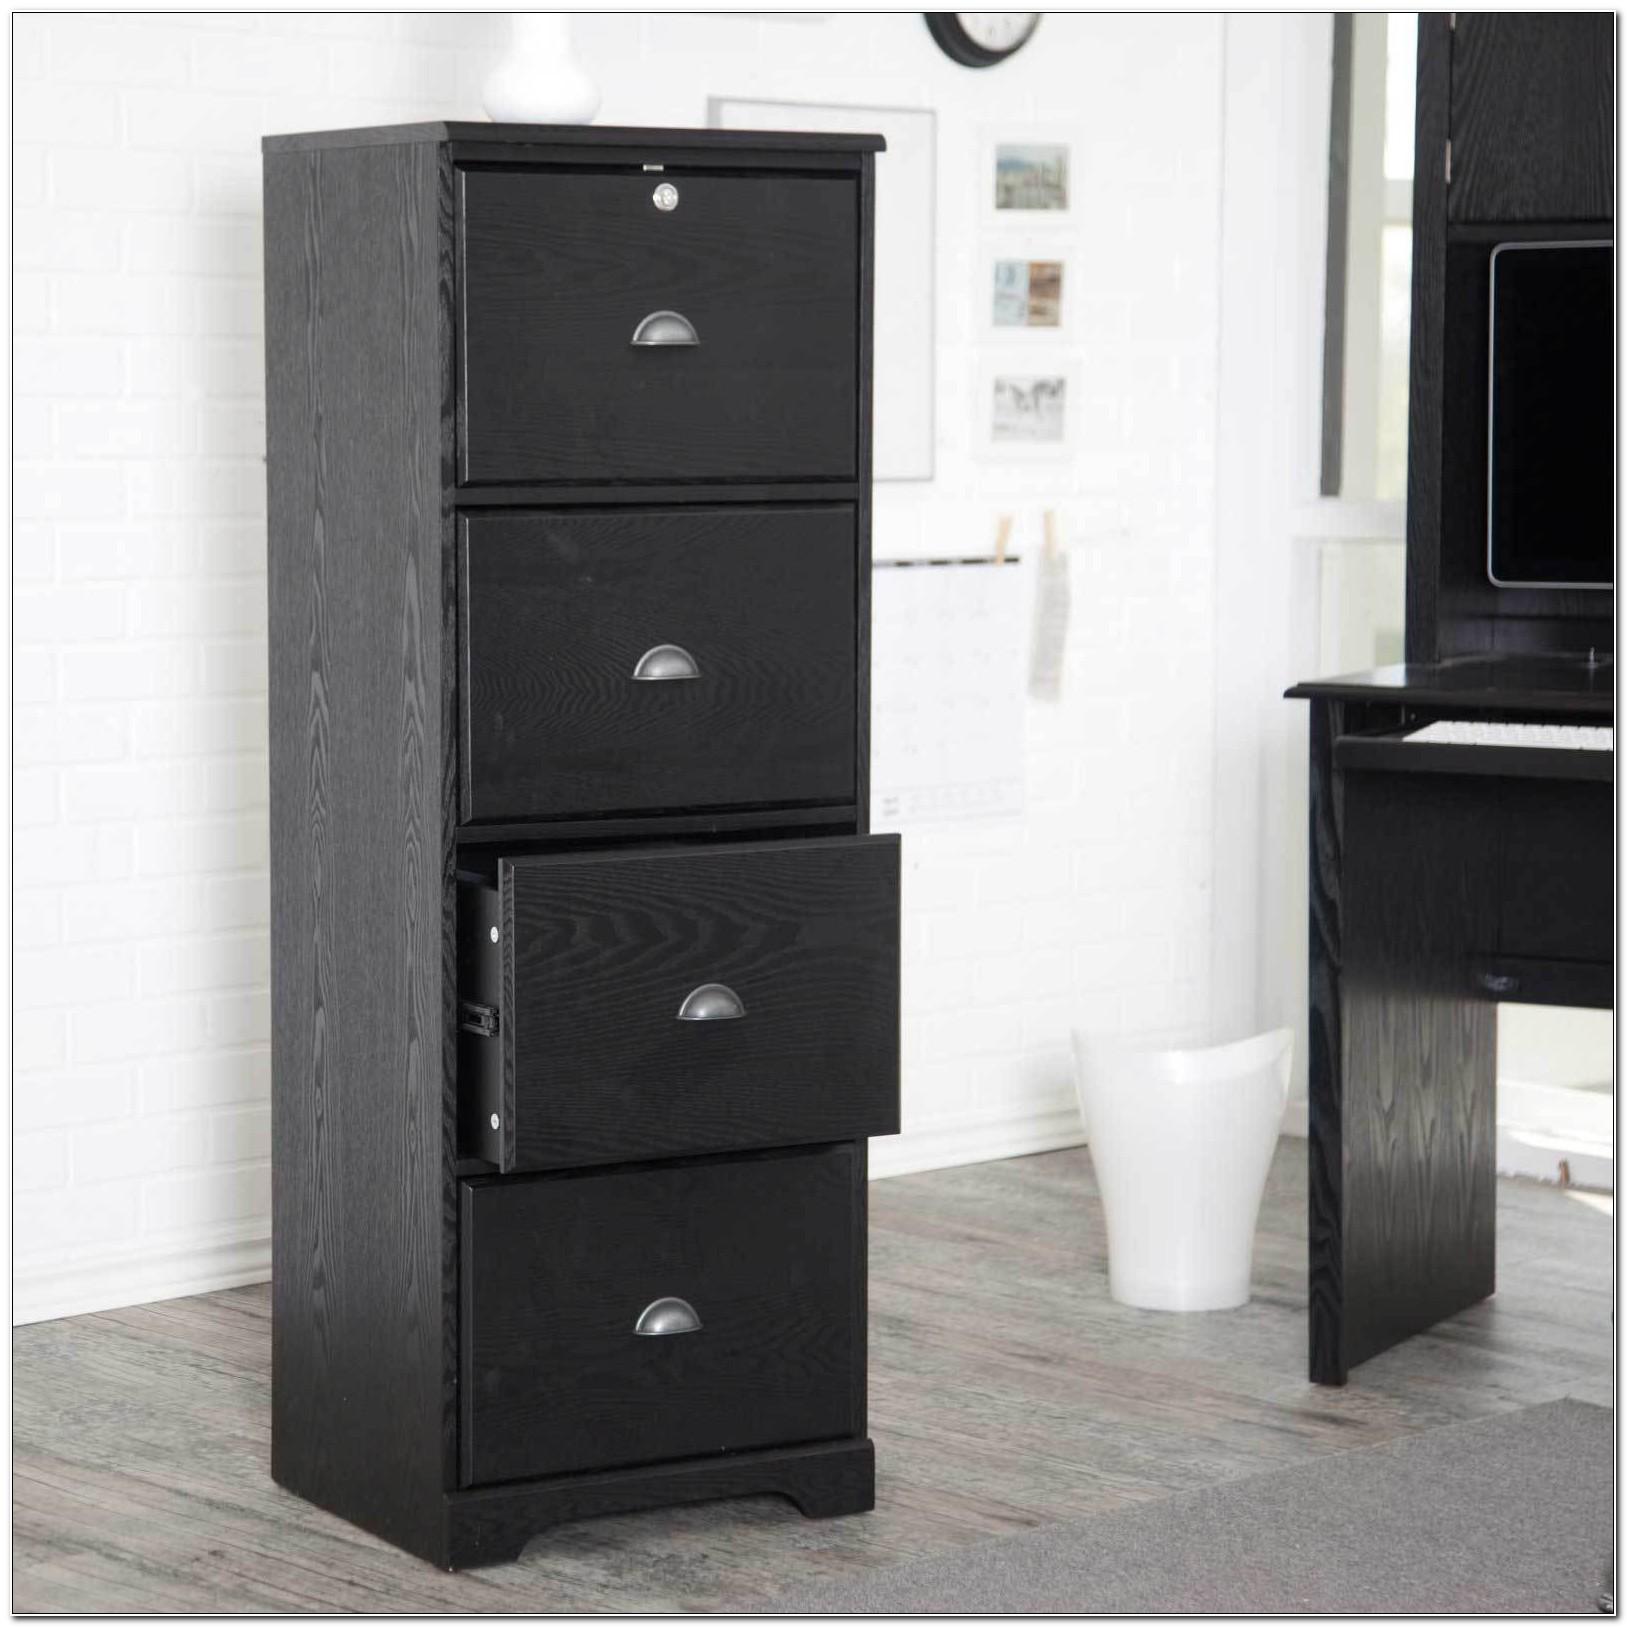 Black Wooden File Cabinets 4 Drawer